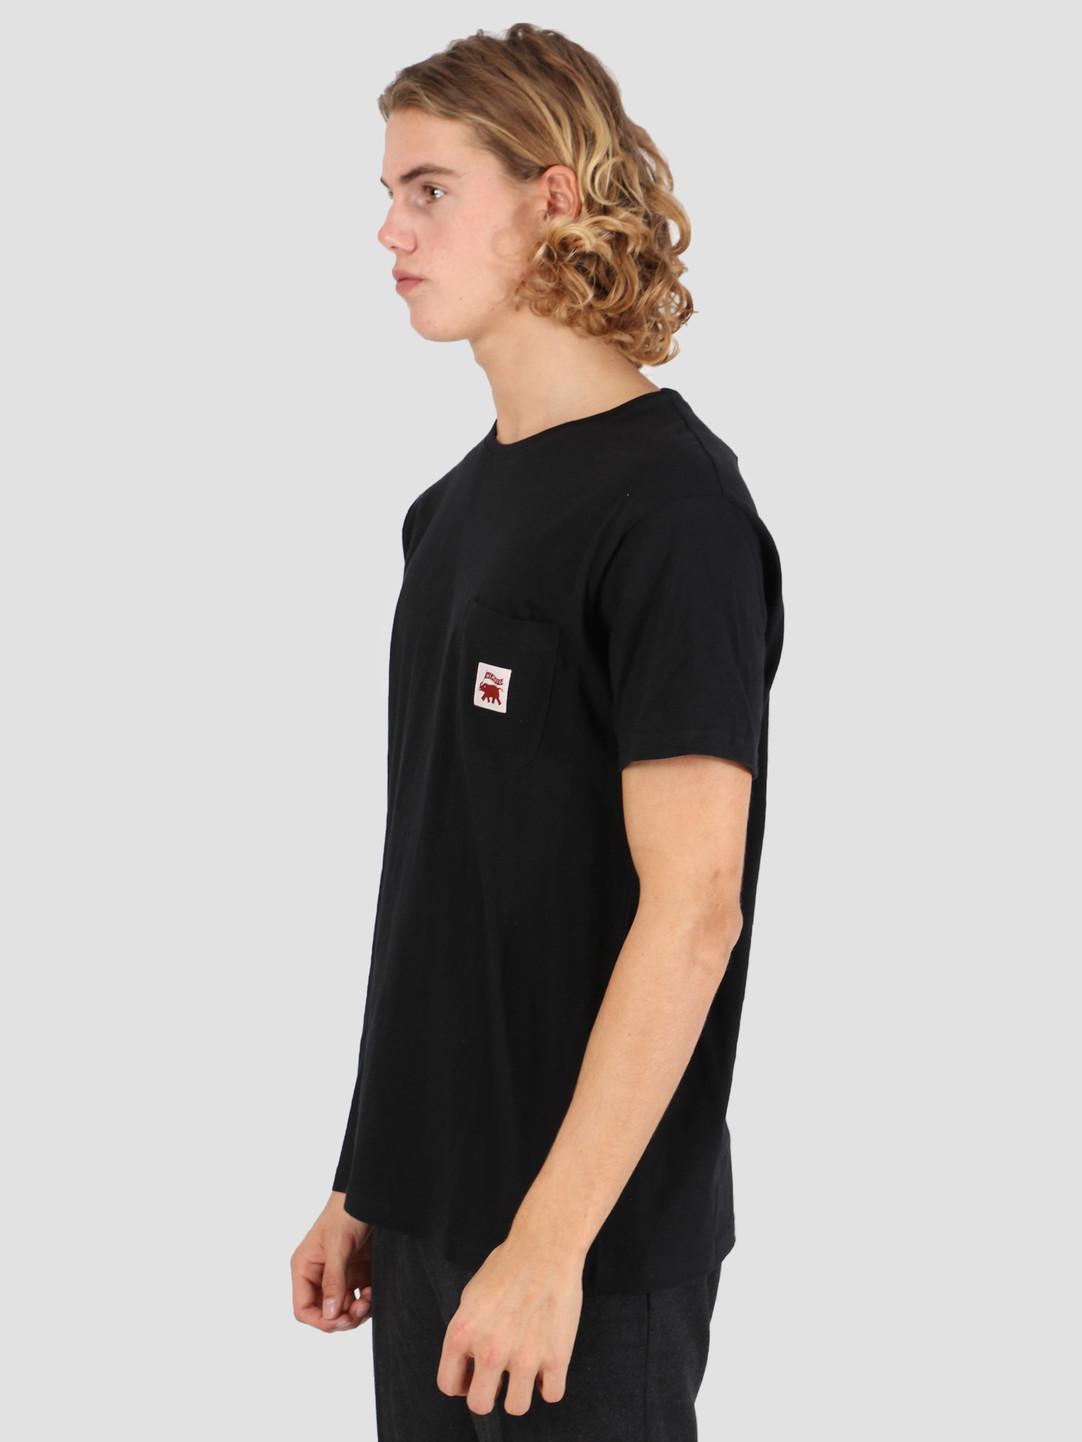 Wemoto Wemoto Toby Jersey Black 131.237-100